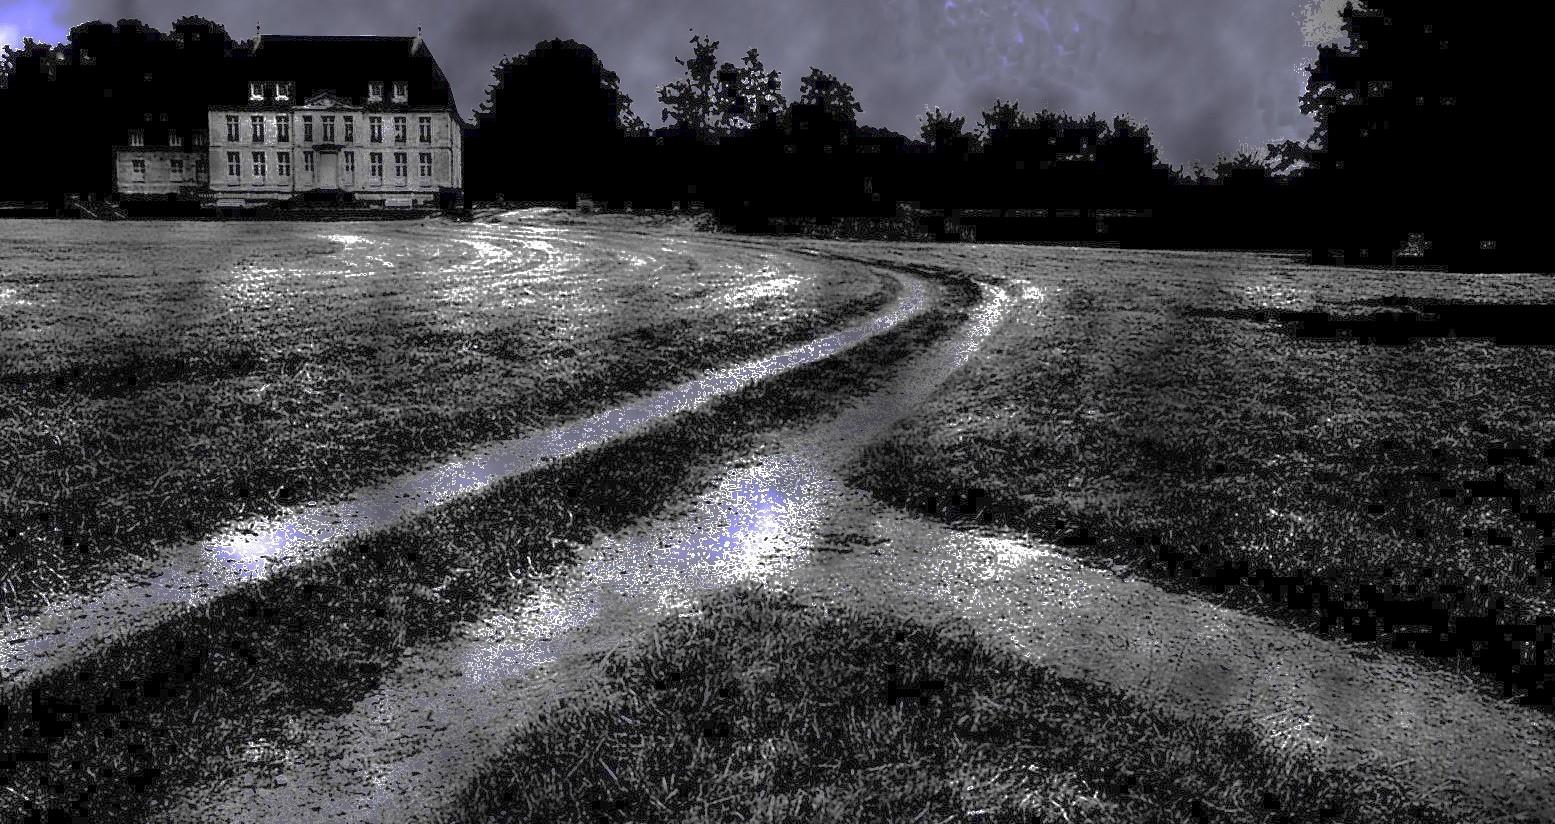 La demeure de la nuit